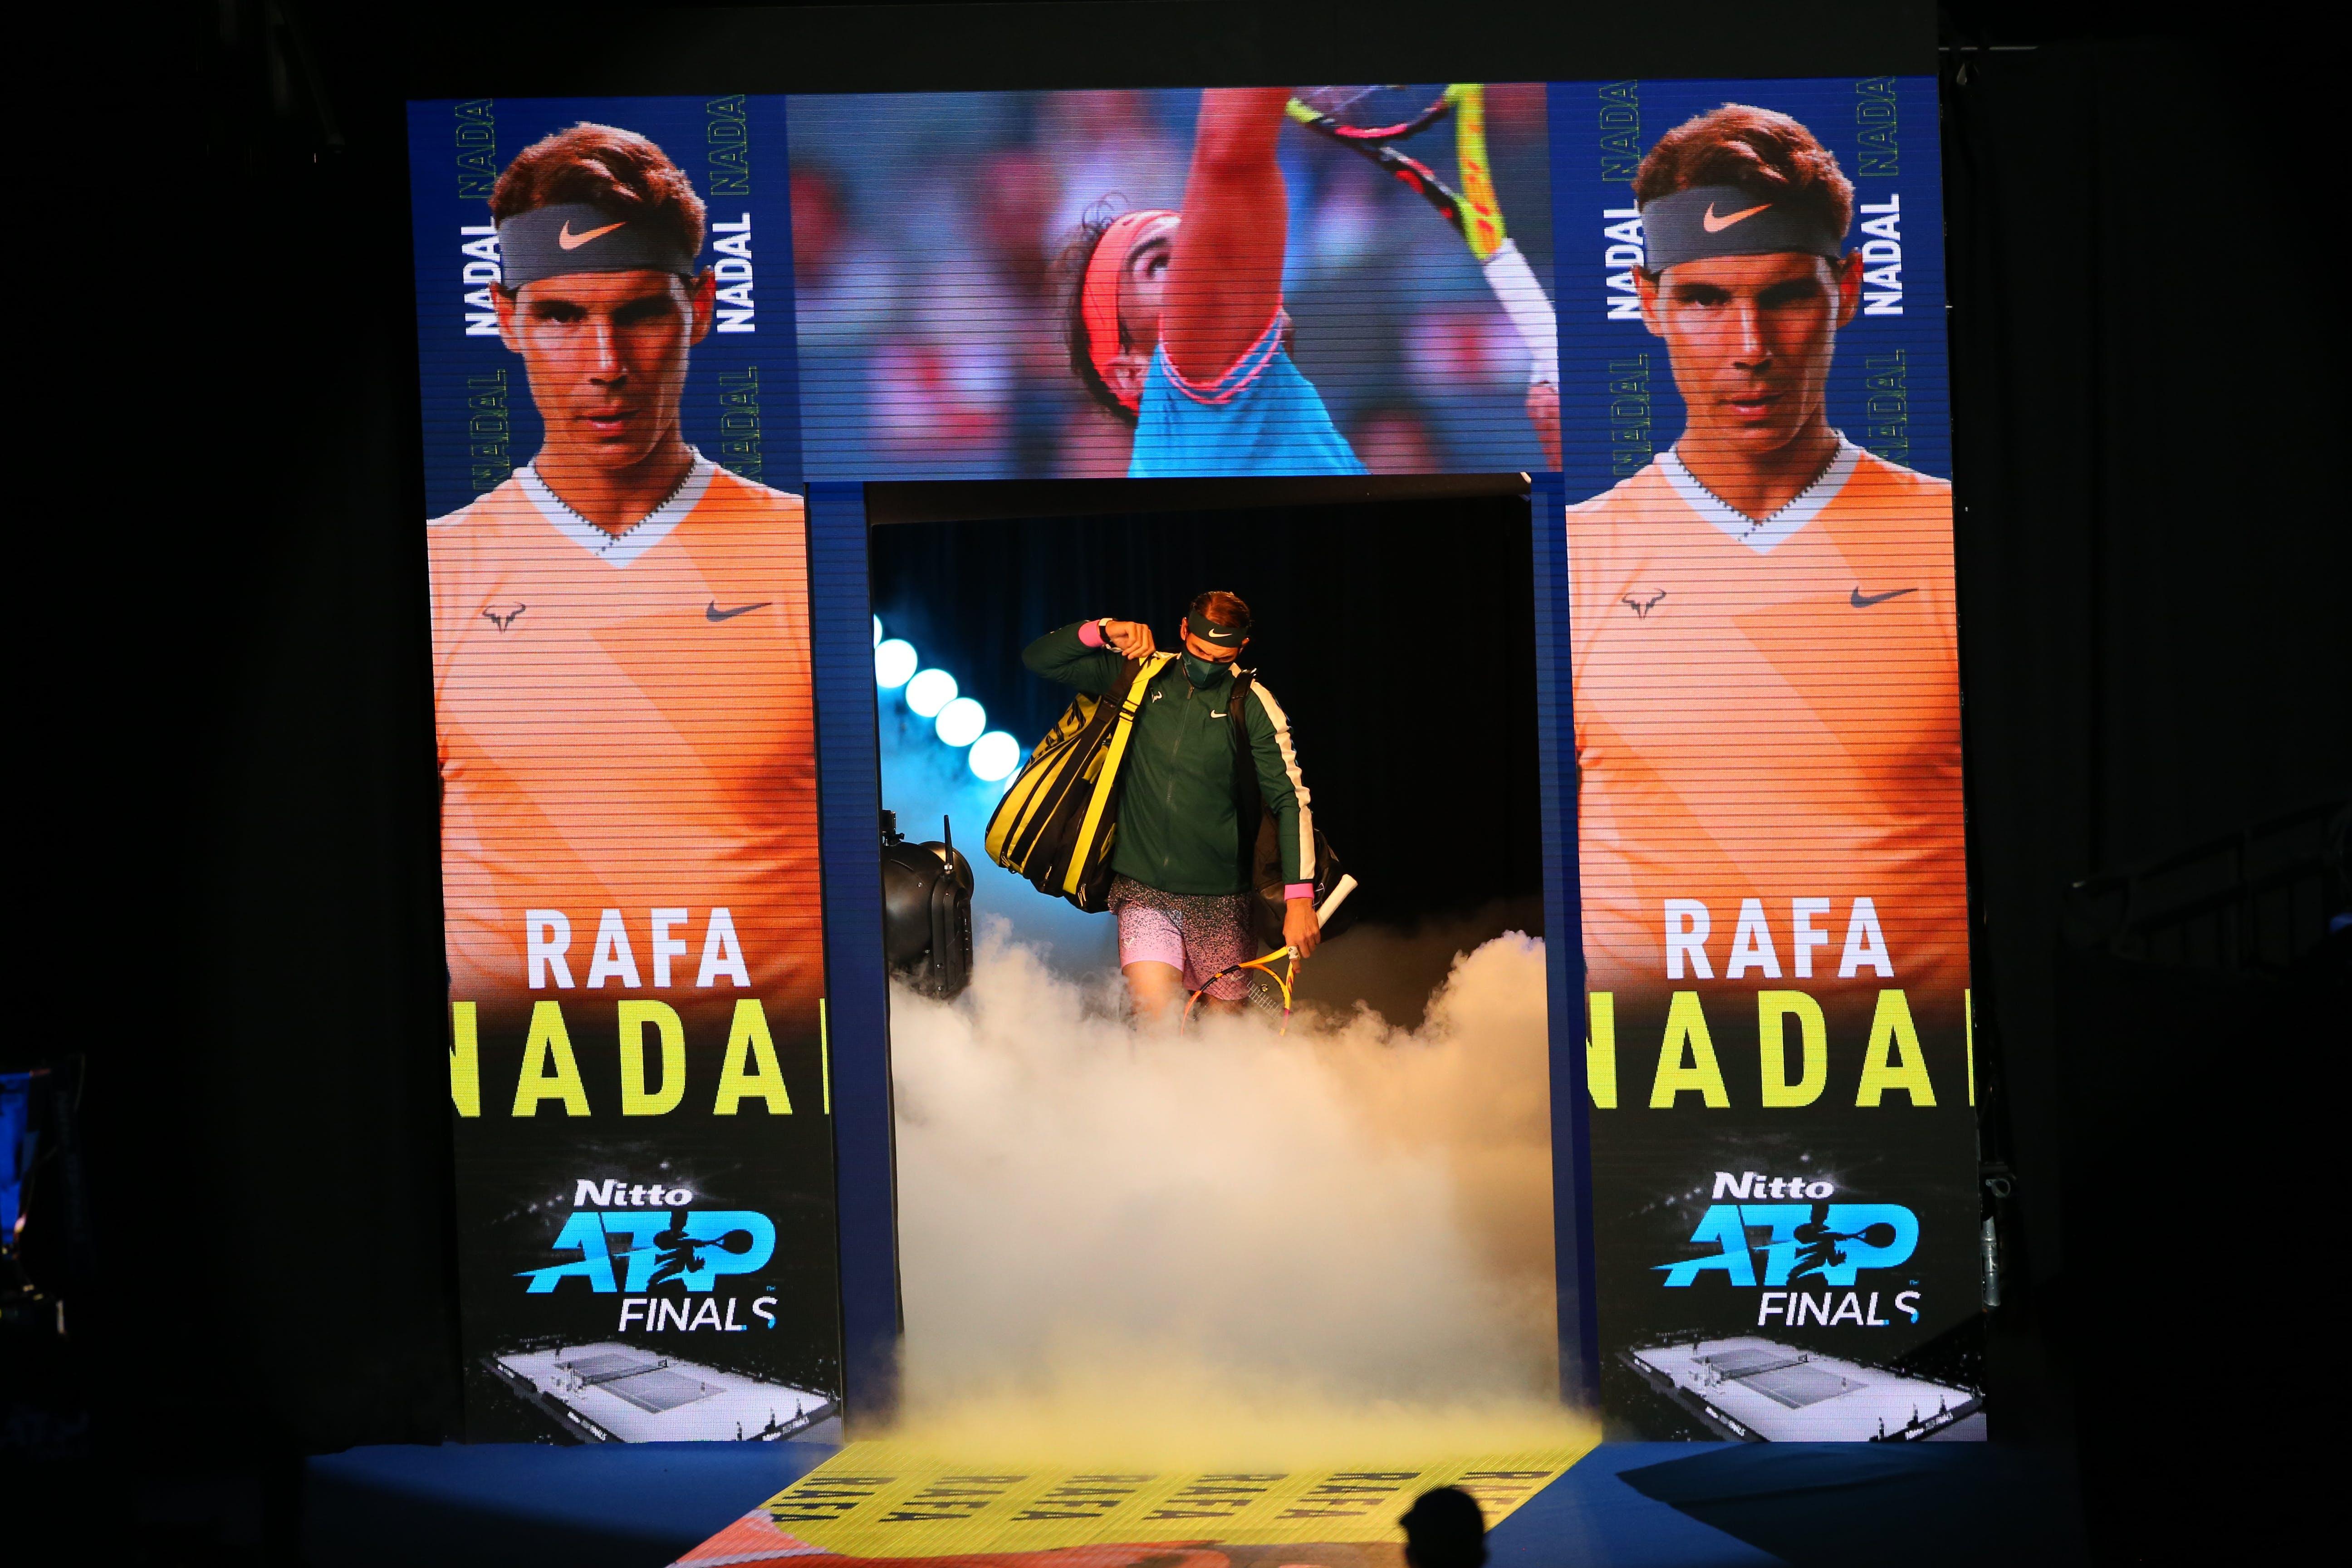 Rafael Nadal and himself at the ATP Finals 2020